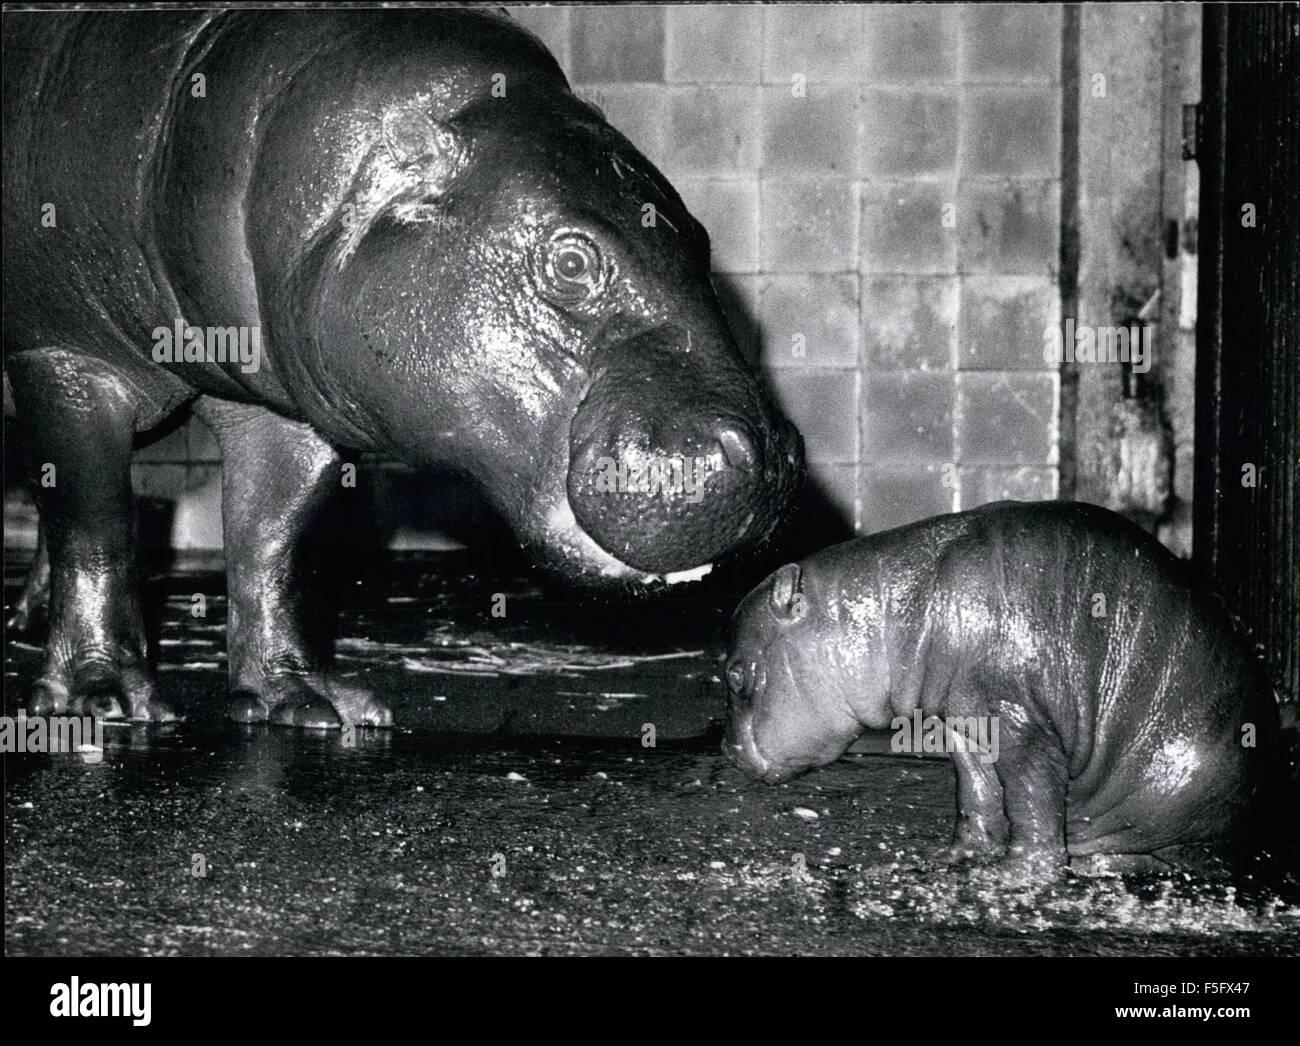 1972 - Young Dwarf Hippopotamus at the Munich Zoo.: It looks rather contrite, the new born dwarf hippopotamus at - Stock Image